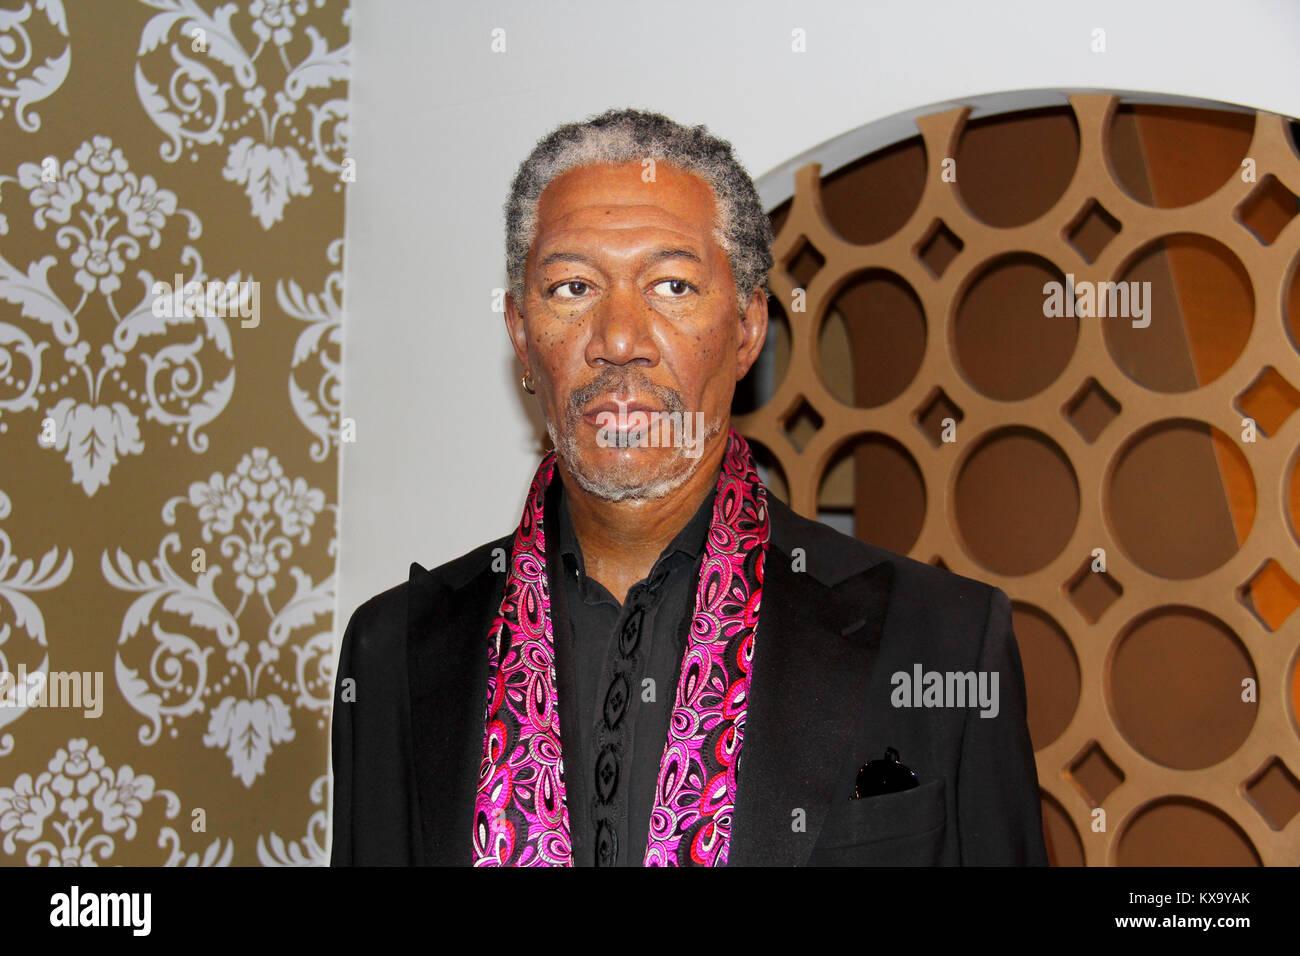 London, - United Kingdom, 08, July 2014. Madame Tussauds in London. Waxwork statue of Morgan Freeman. - Stock Image